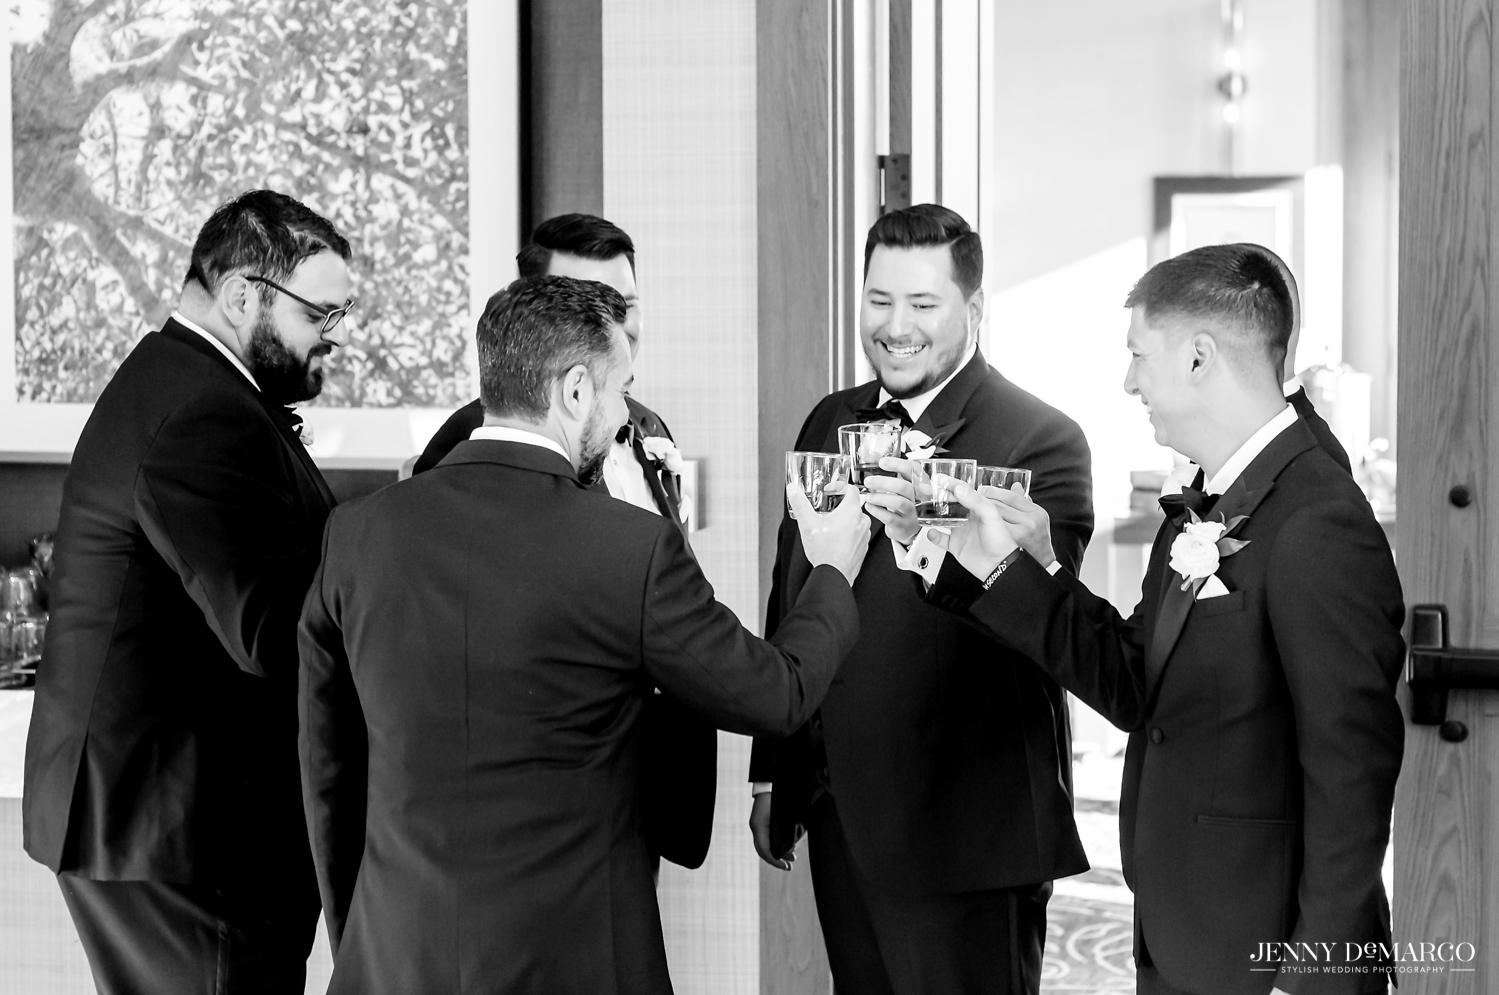 groom and groomsmen toasting before the wedding